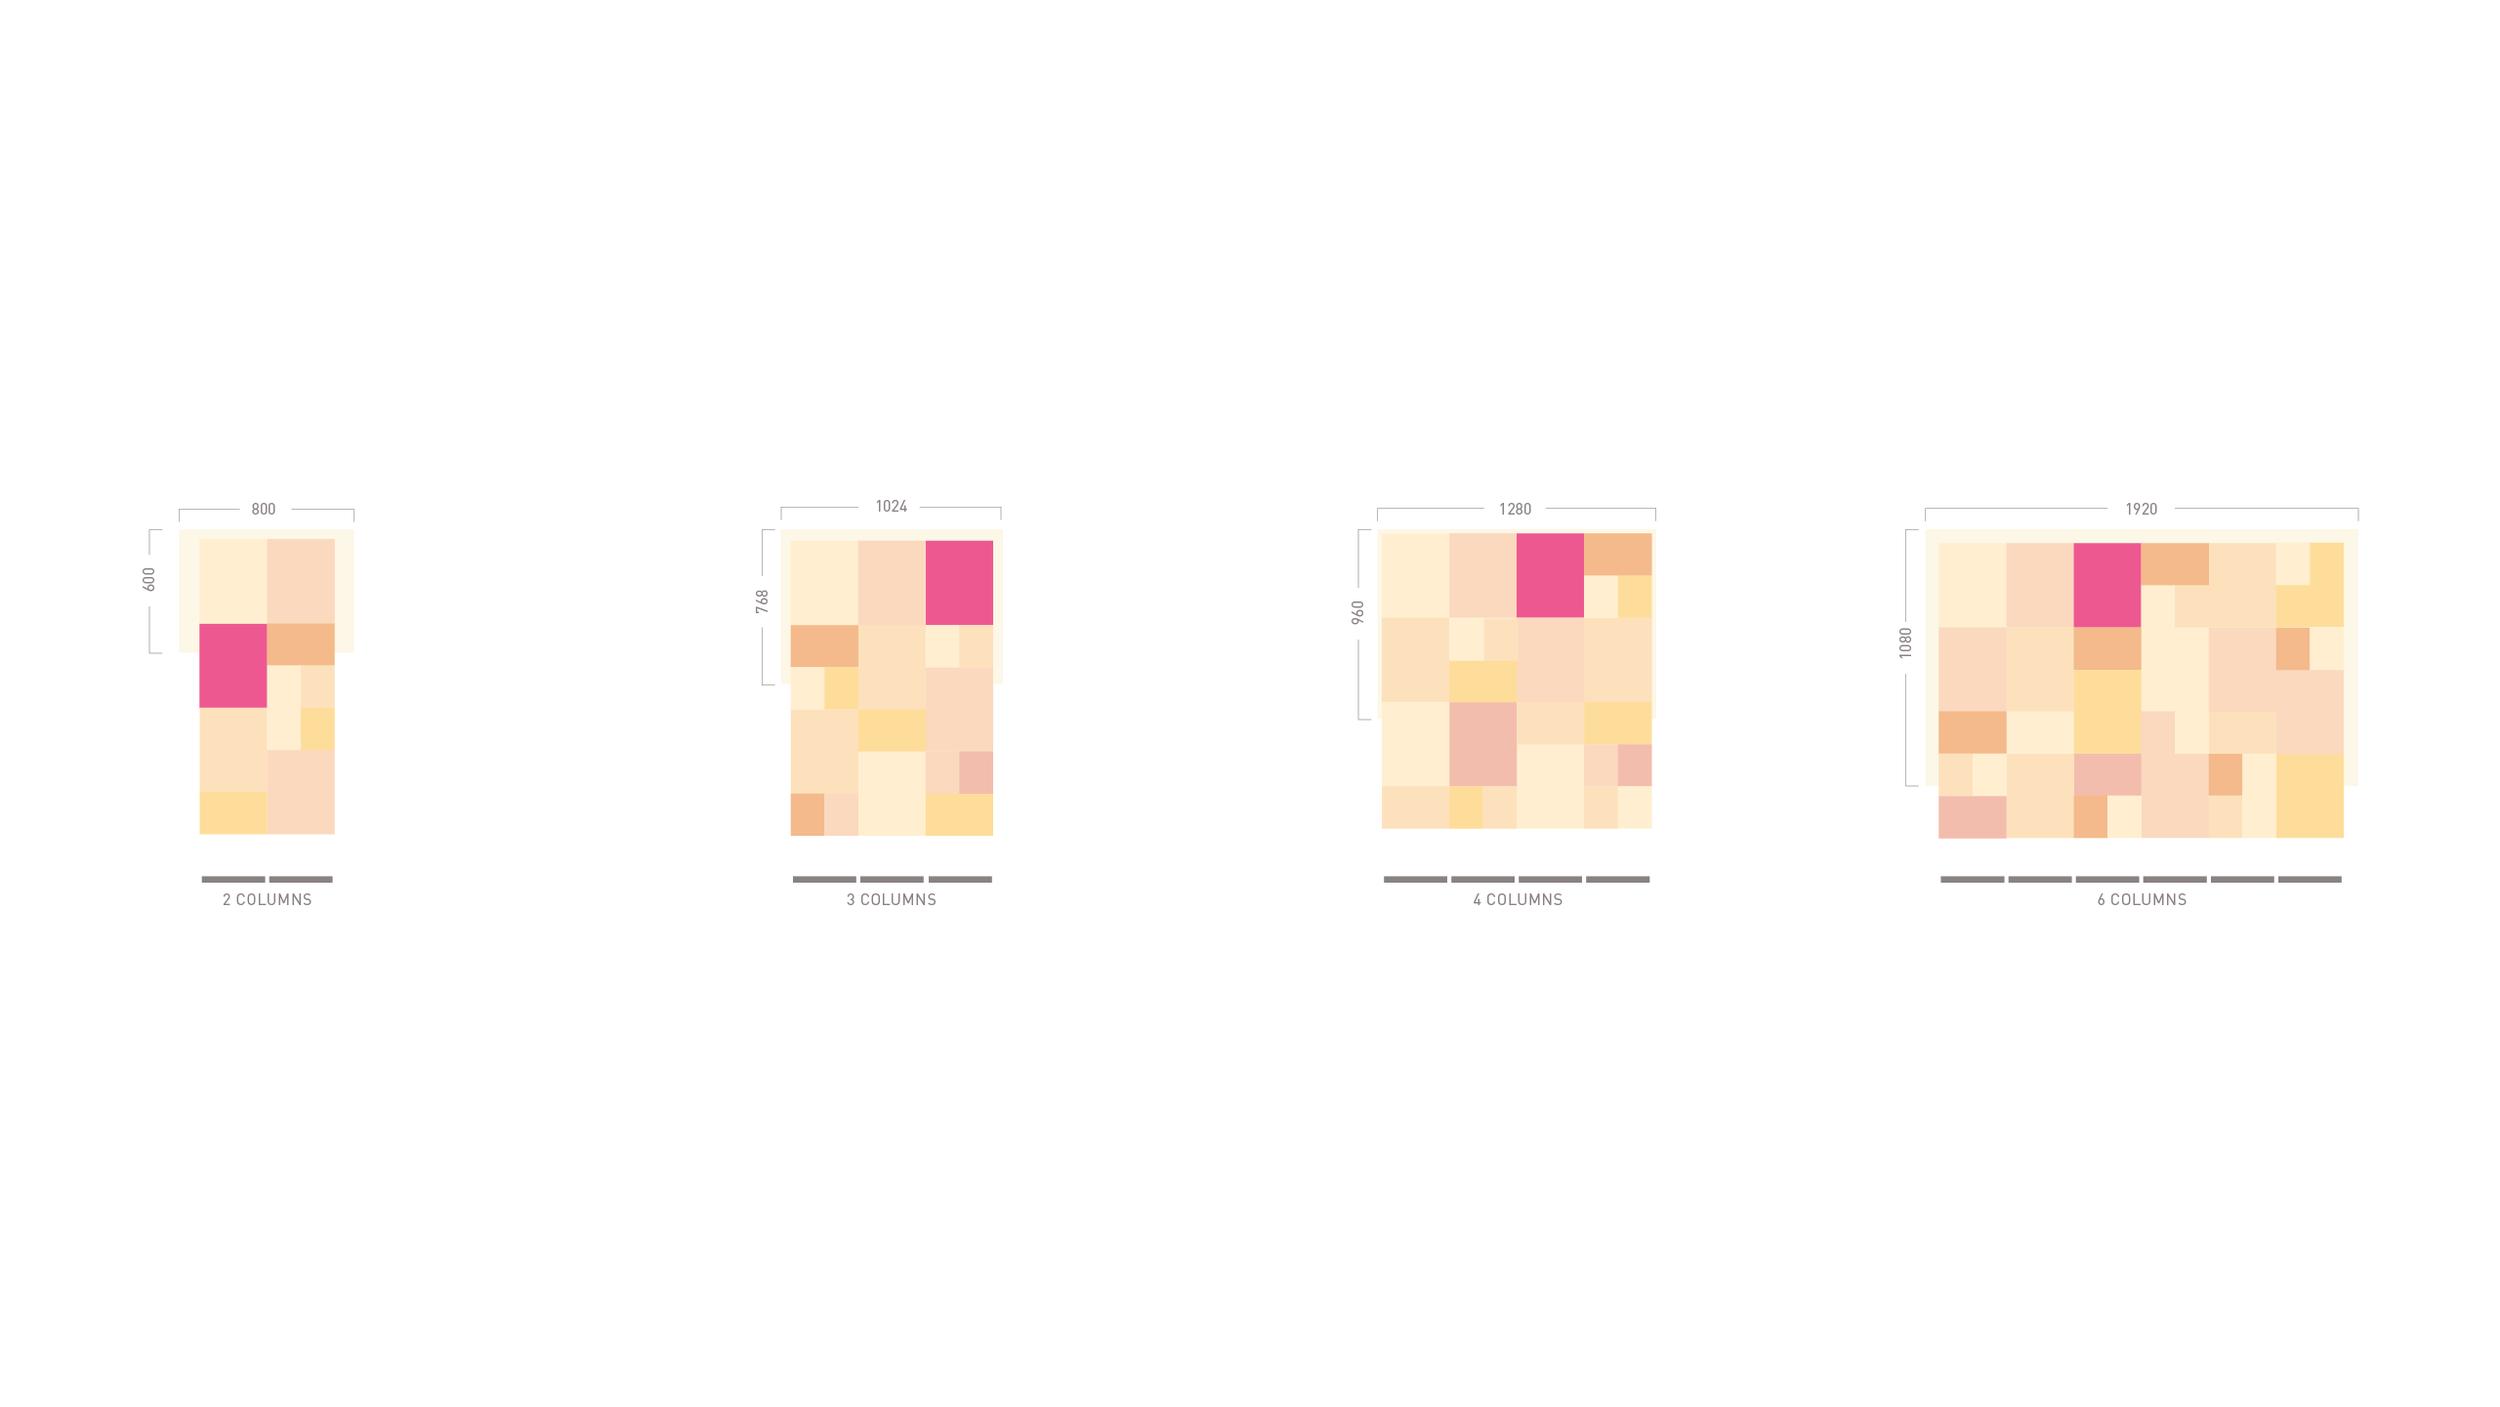 Yoplait_PresentationIllustrations_02_800_1024_04.png